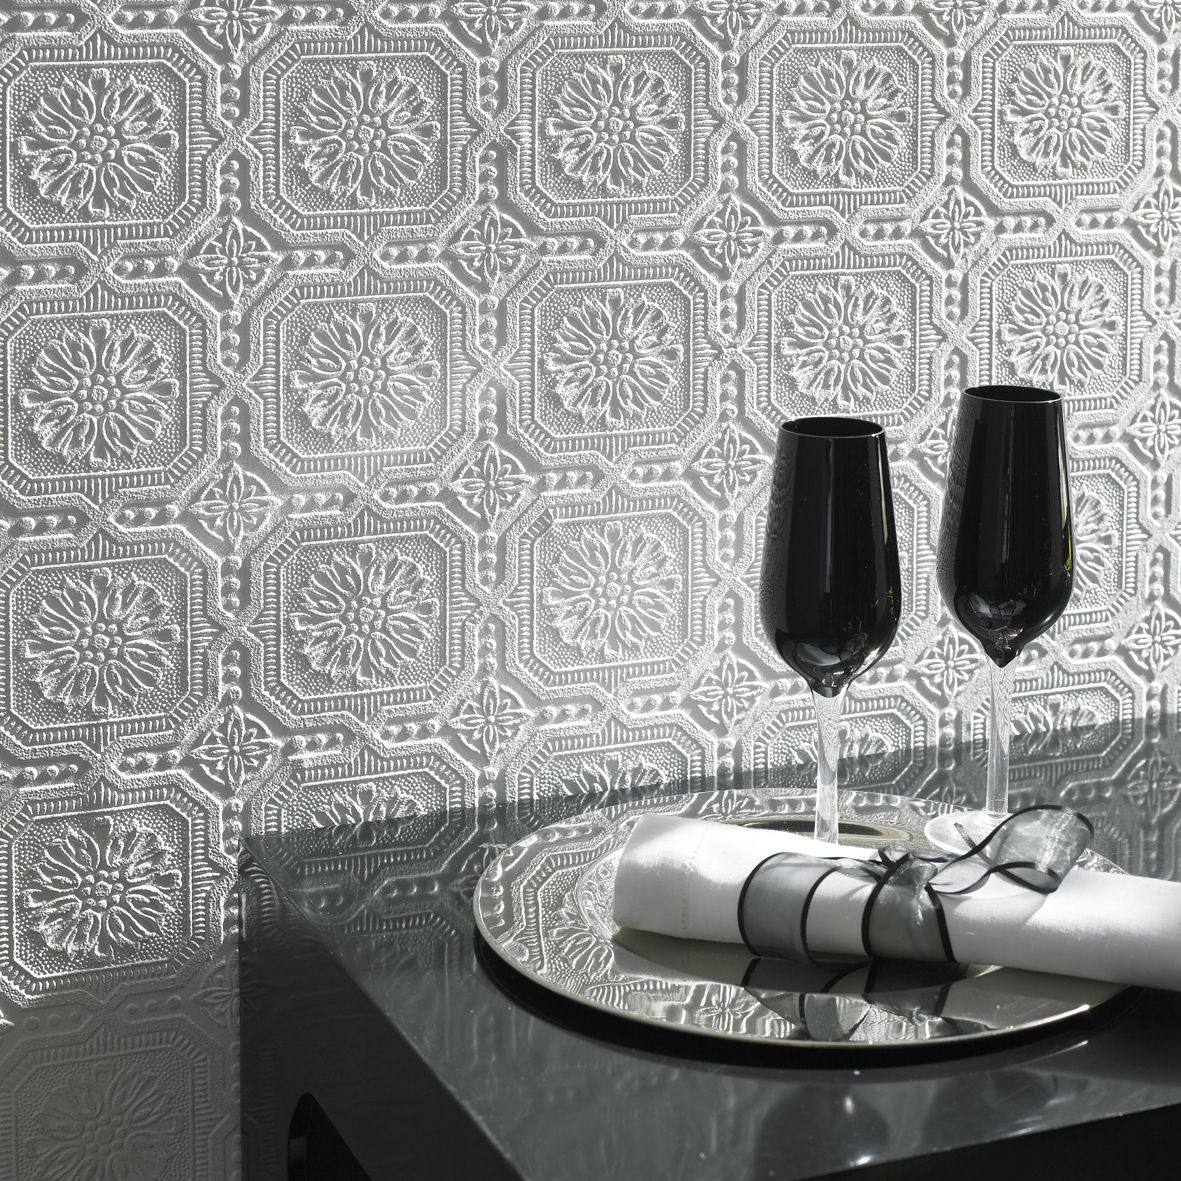 48+ Embossed Wallpaper for Backsplash on WallpaperSafari